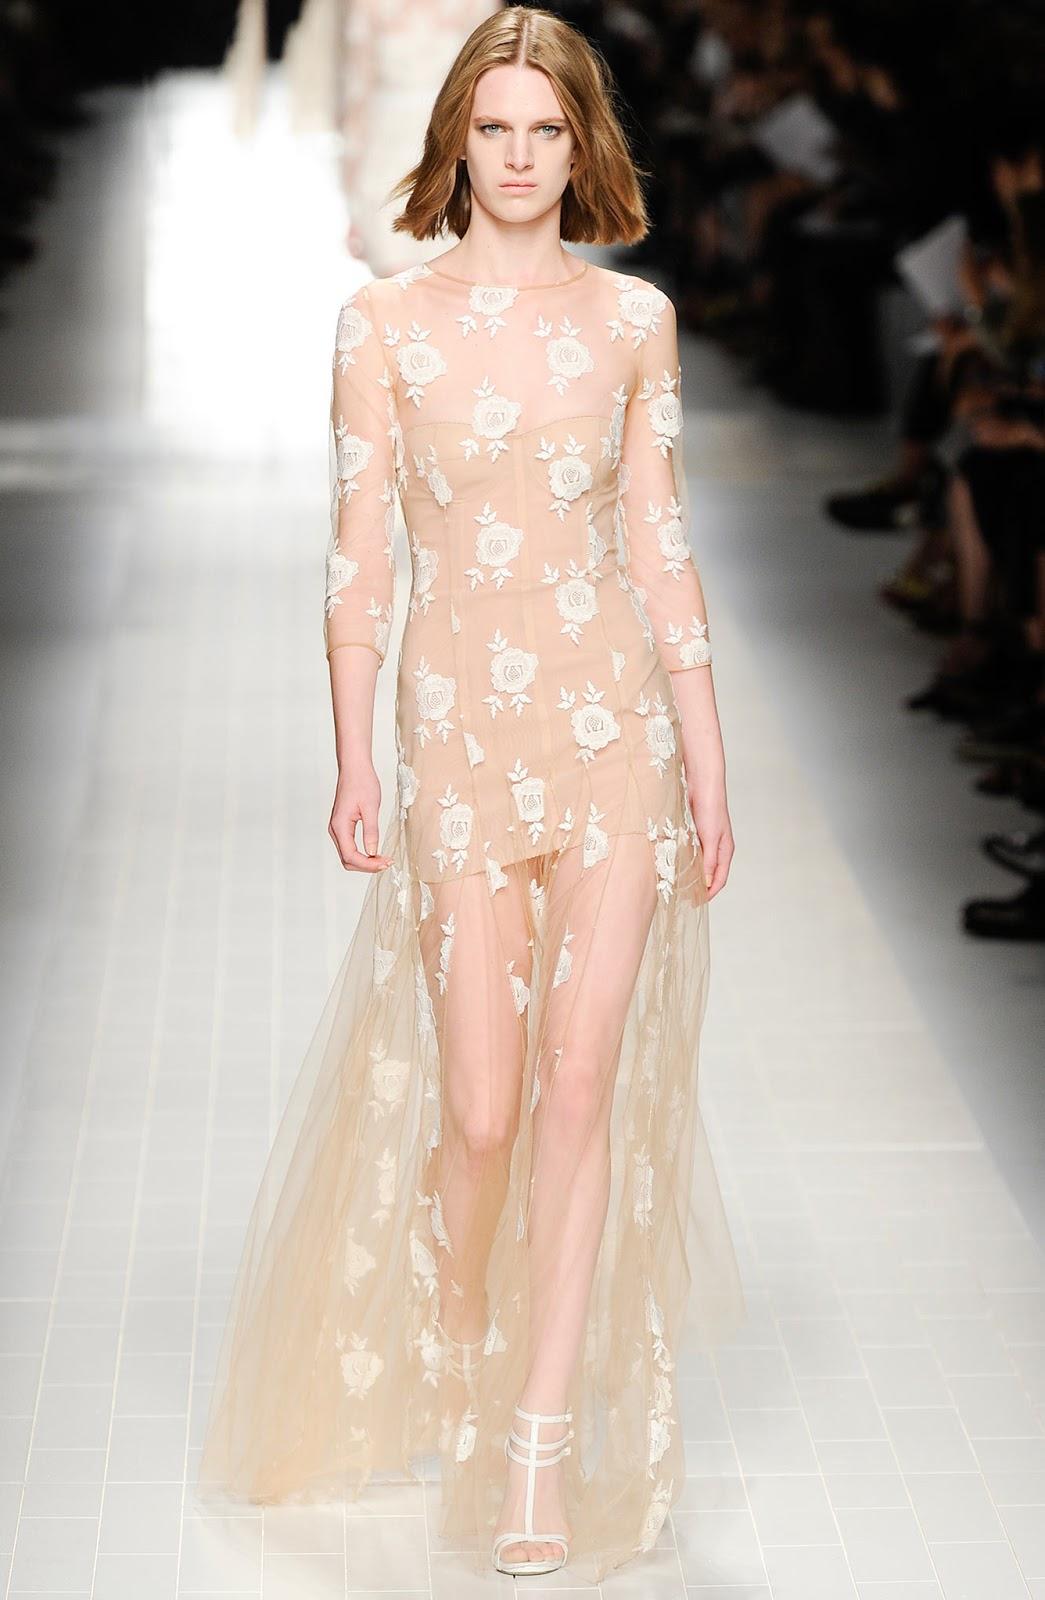 Blumarine lace dress | Spring/Summer 2014 | via fashioned by love british fashion blog